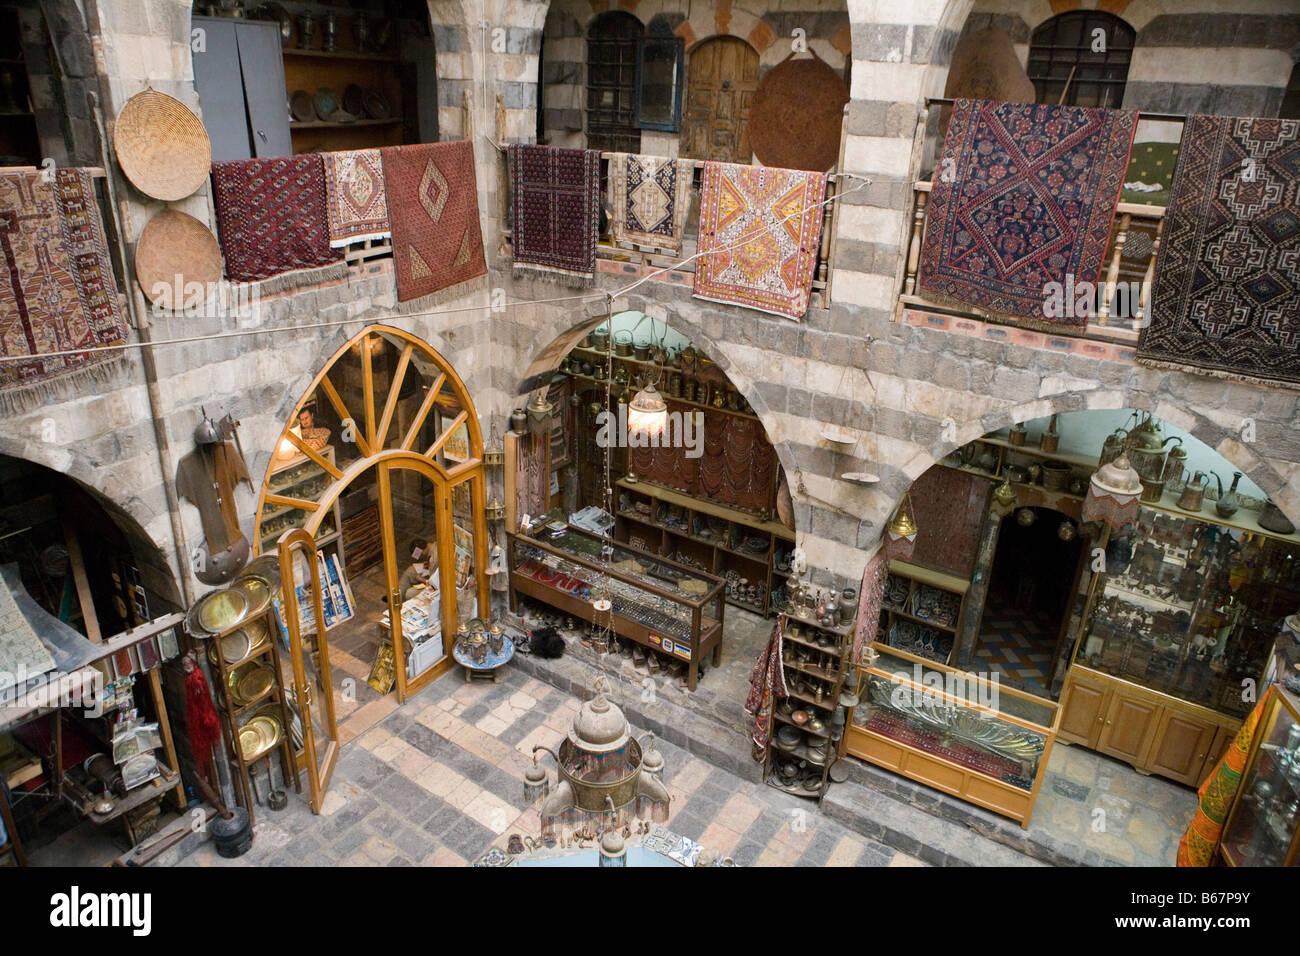 Carpet and Handicrafts Shop, Damascus, Syria, Asia - Stock Image